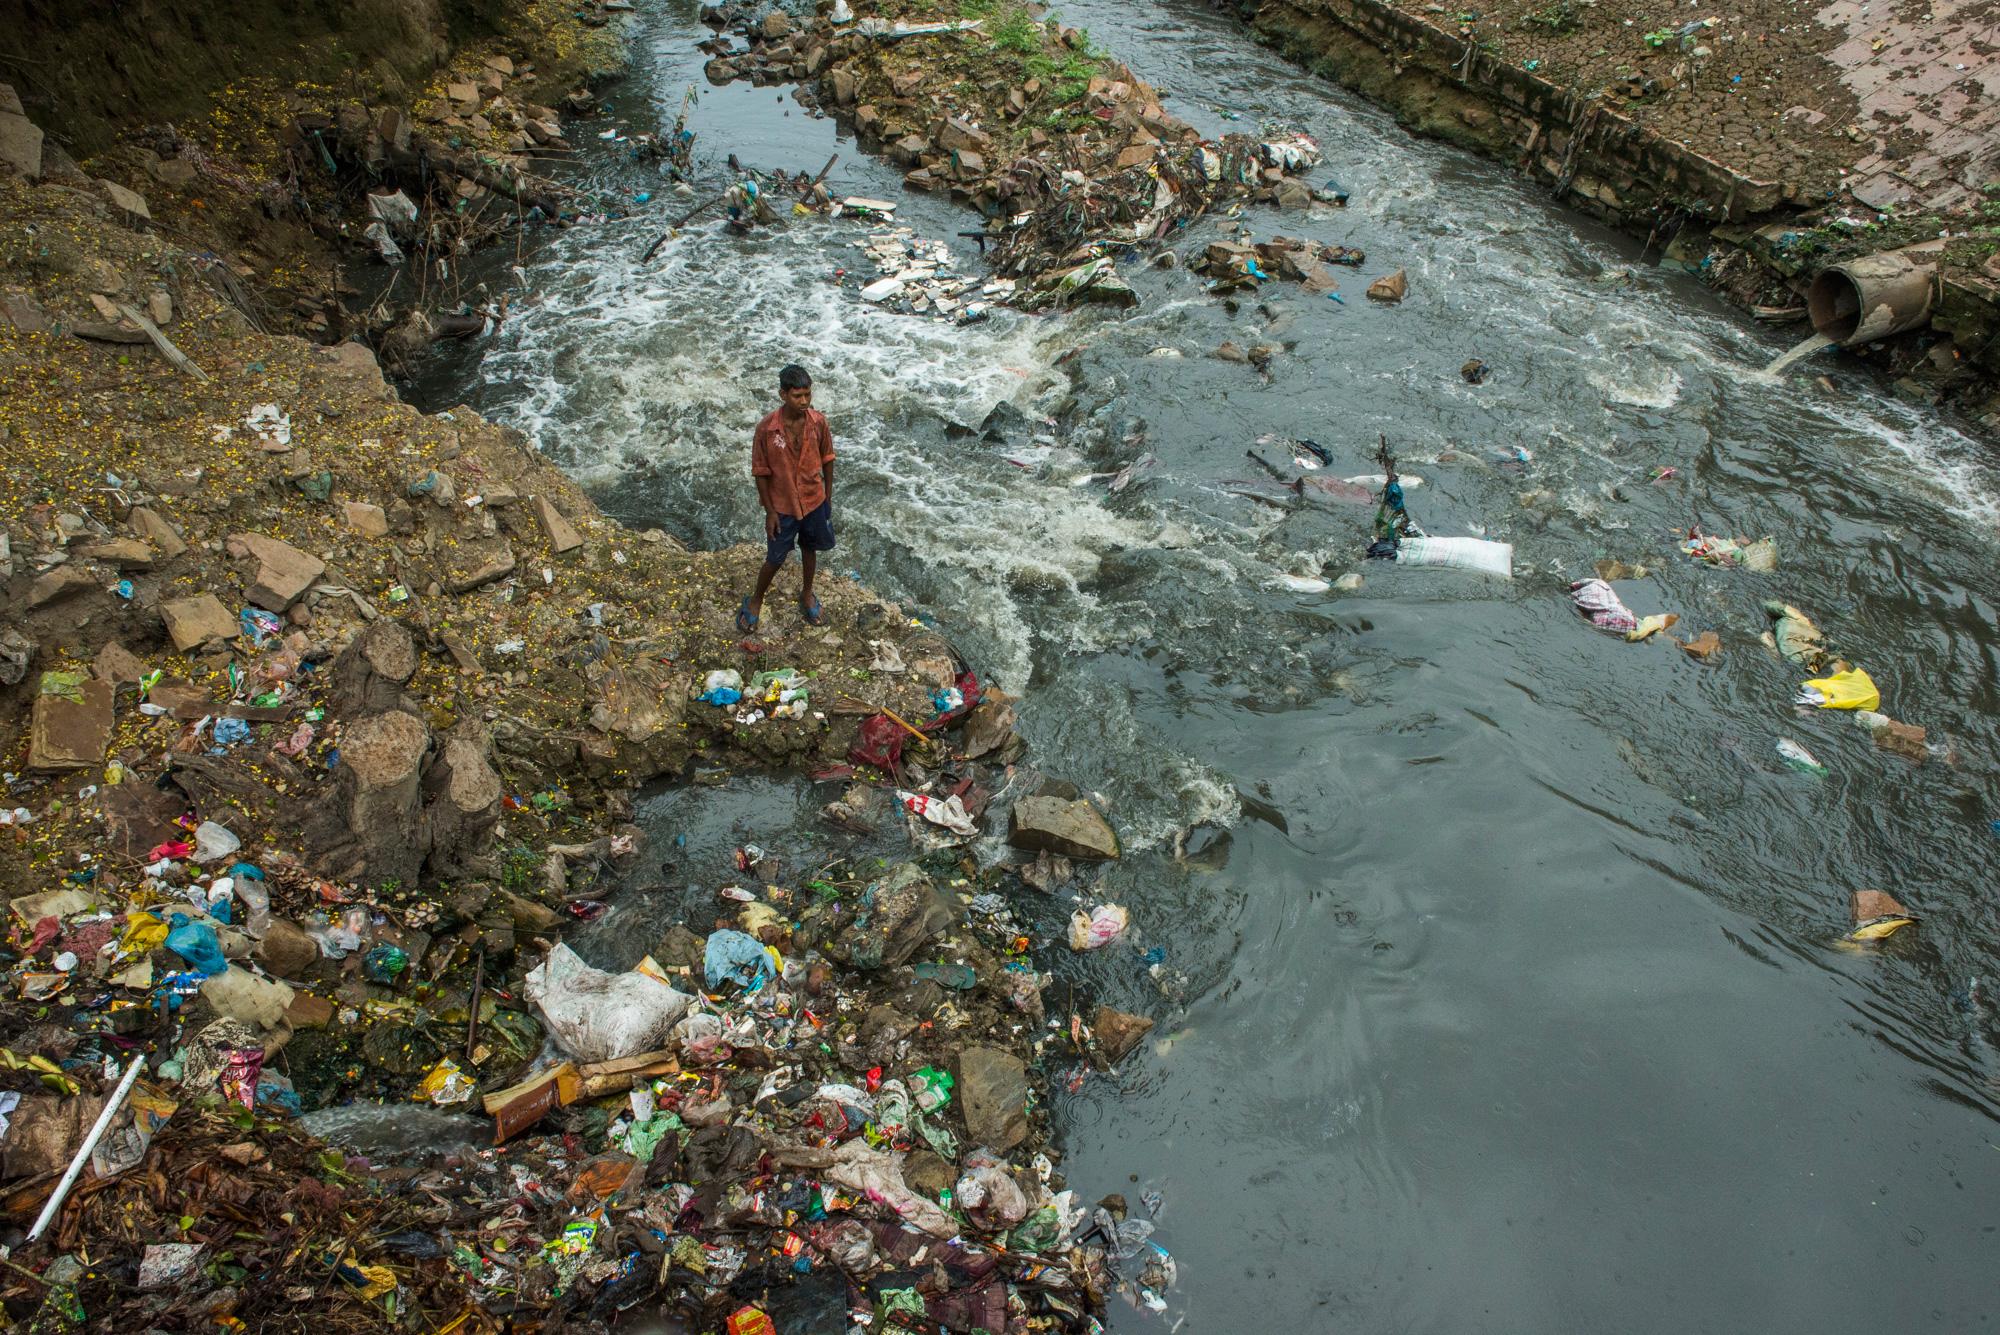 waste-rivers-india.jpg